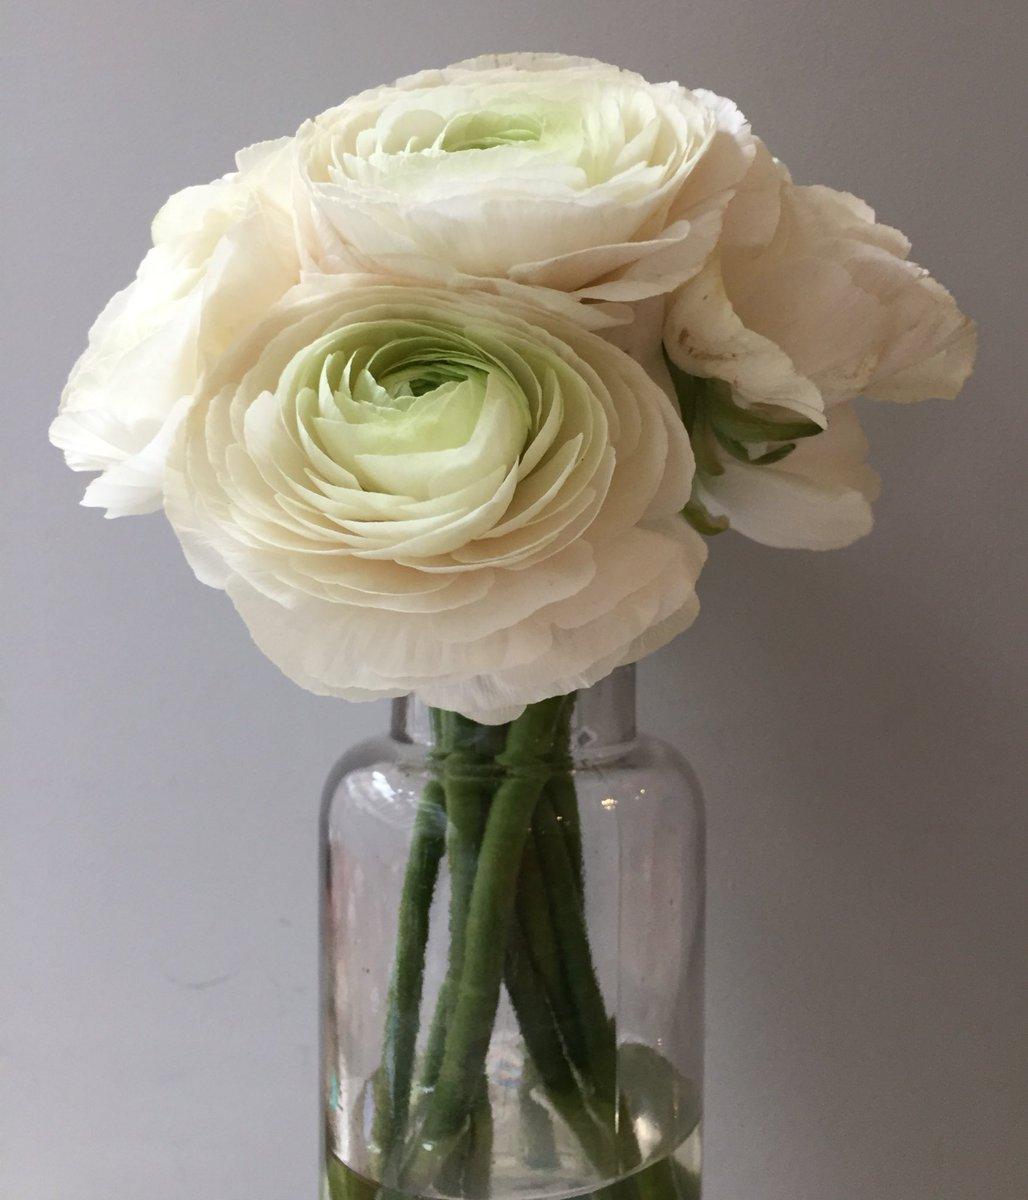 Flowerbx On Twitter Ballet Slippers Ranunculus Thats All